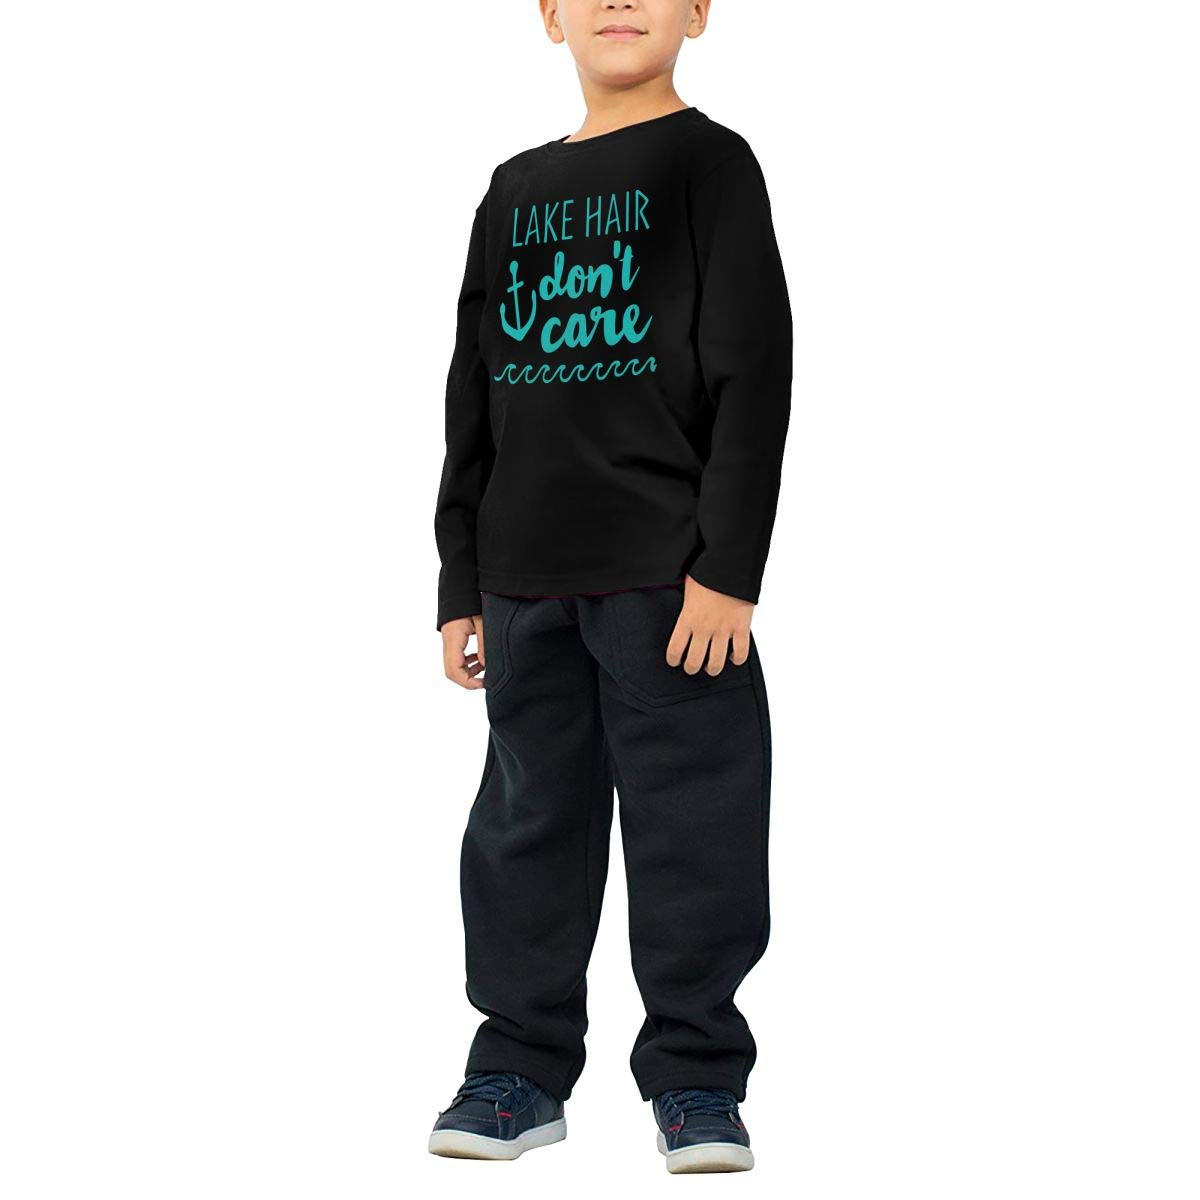 CERTONGCXTS Toddler Dont Care ComfortSoft Long Sleeve Tee